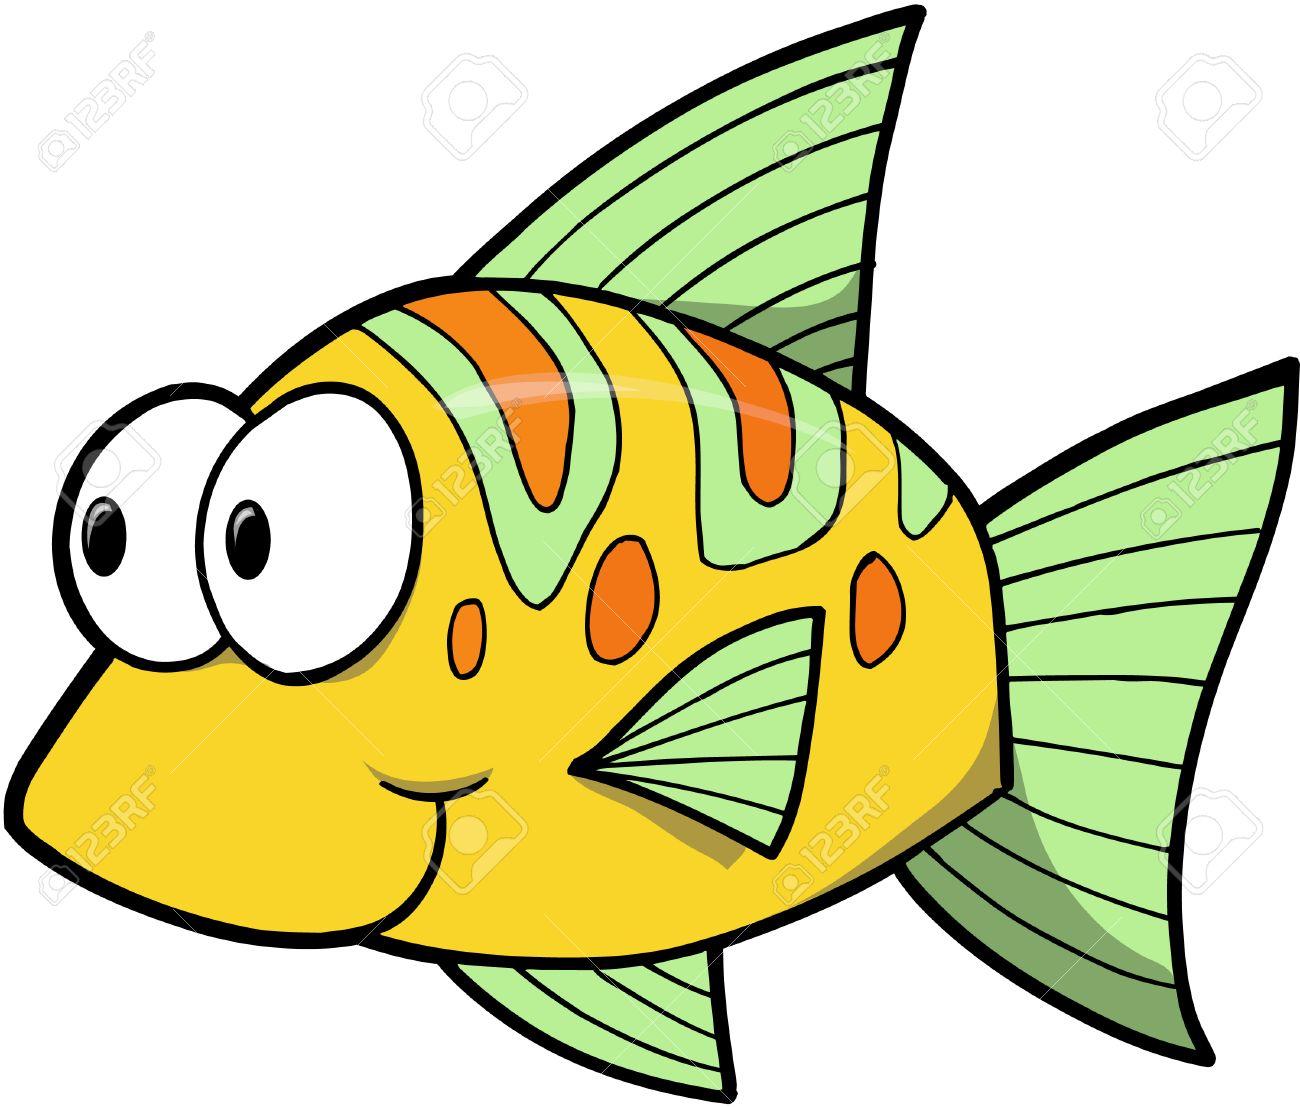 Yellow Fish Vector Illustration Royalty Free Cliparts, Vectors ...